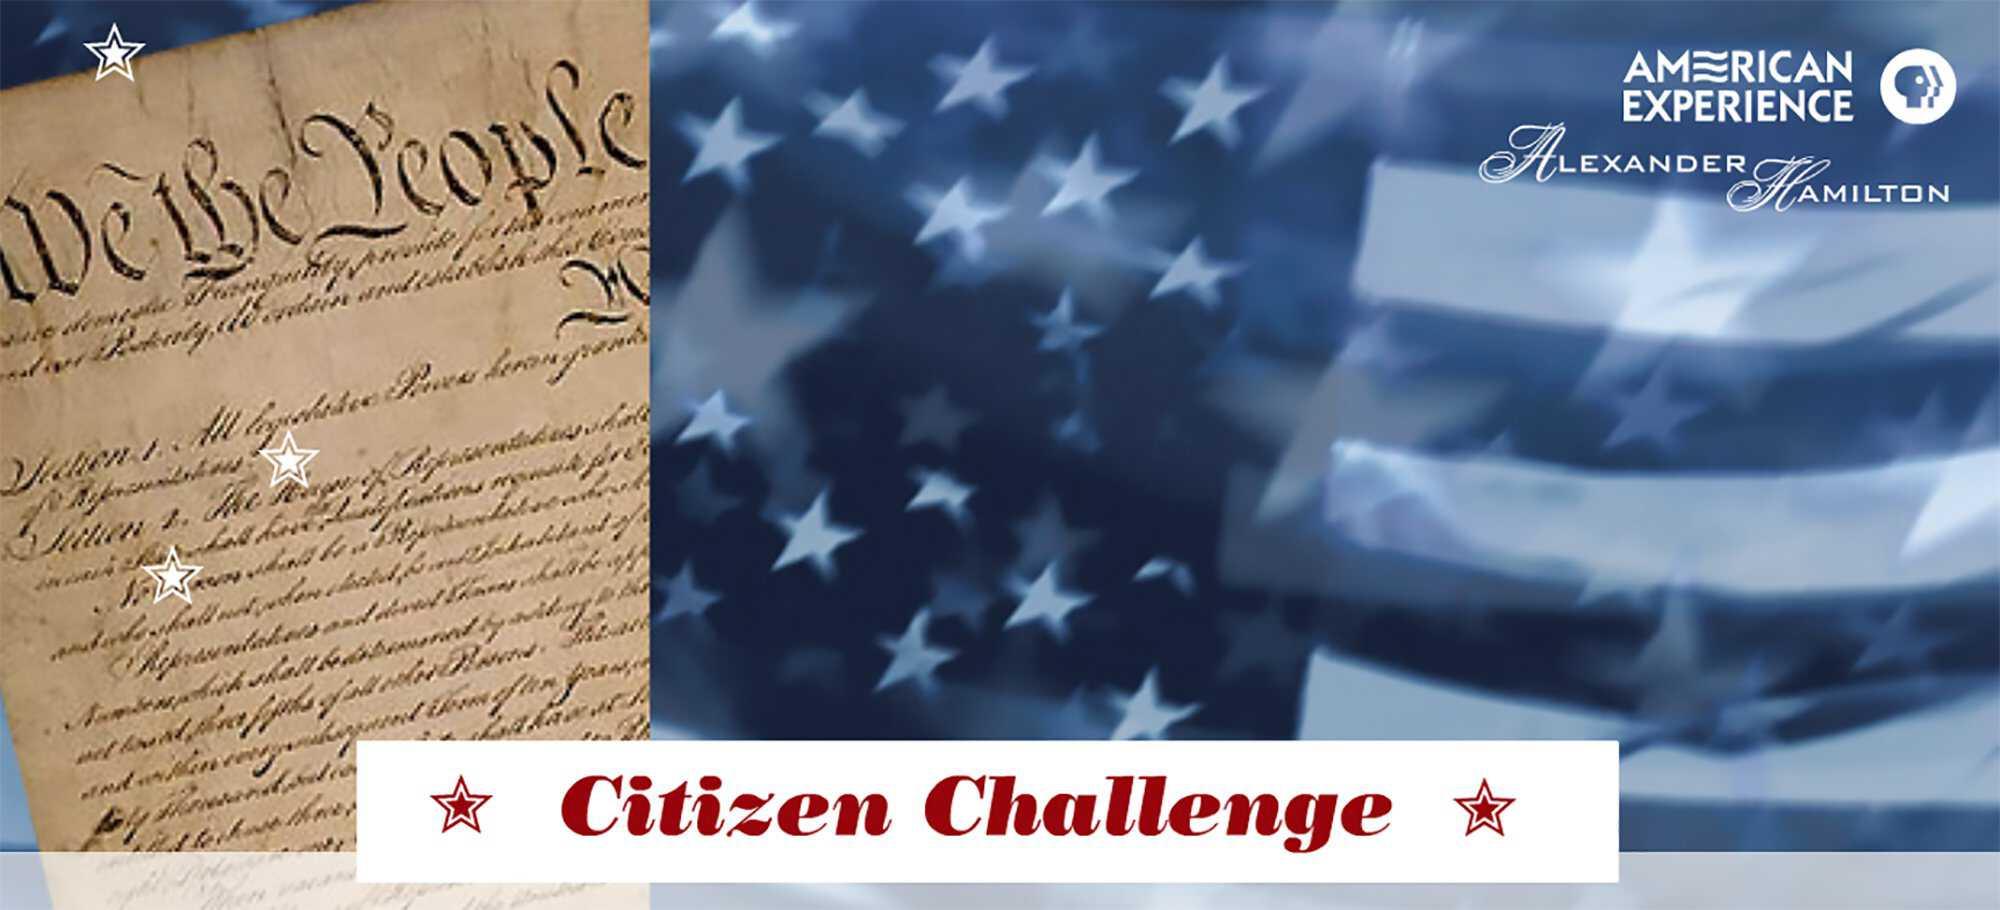 Hamilton-Citizen-quiz-feature.jpg